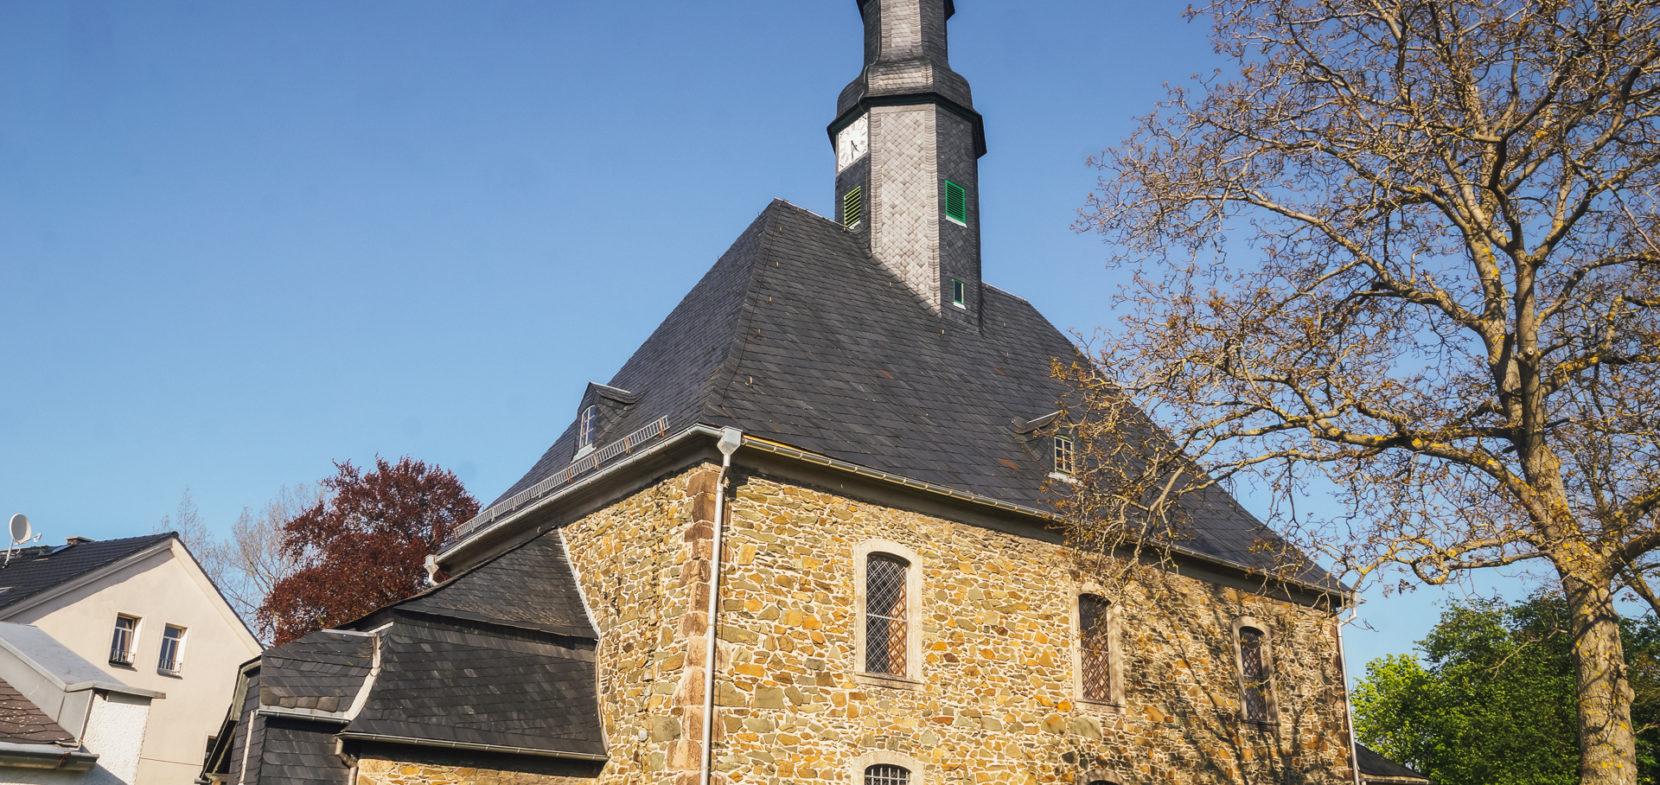 Culitzsch – Laurentius-Kirche